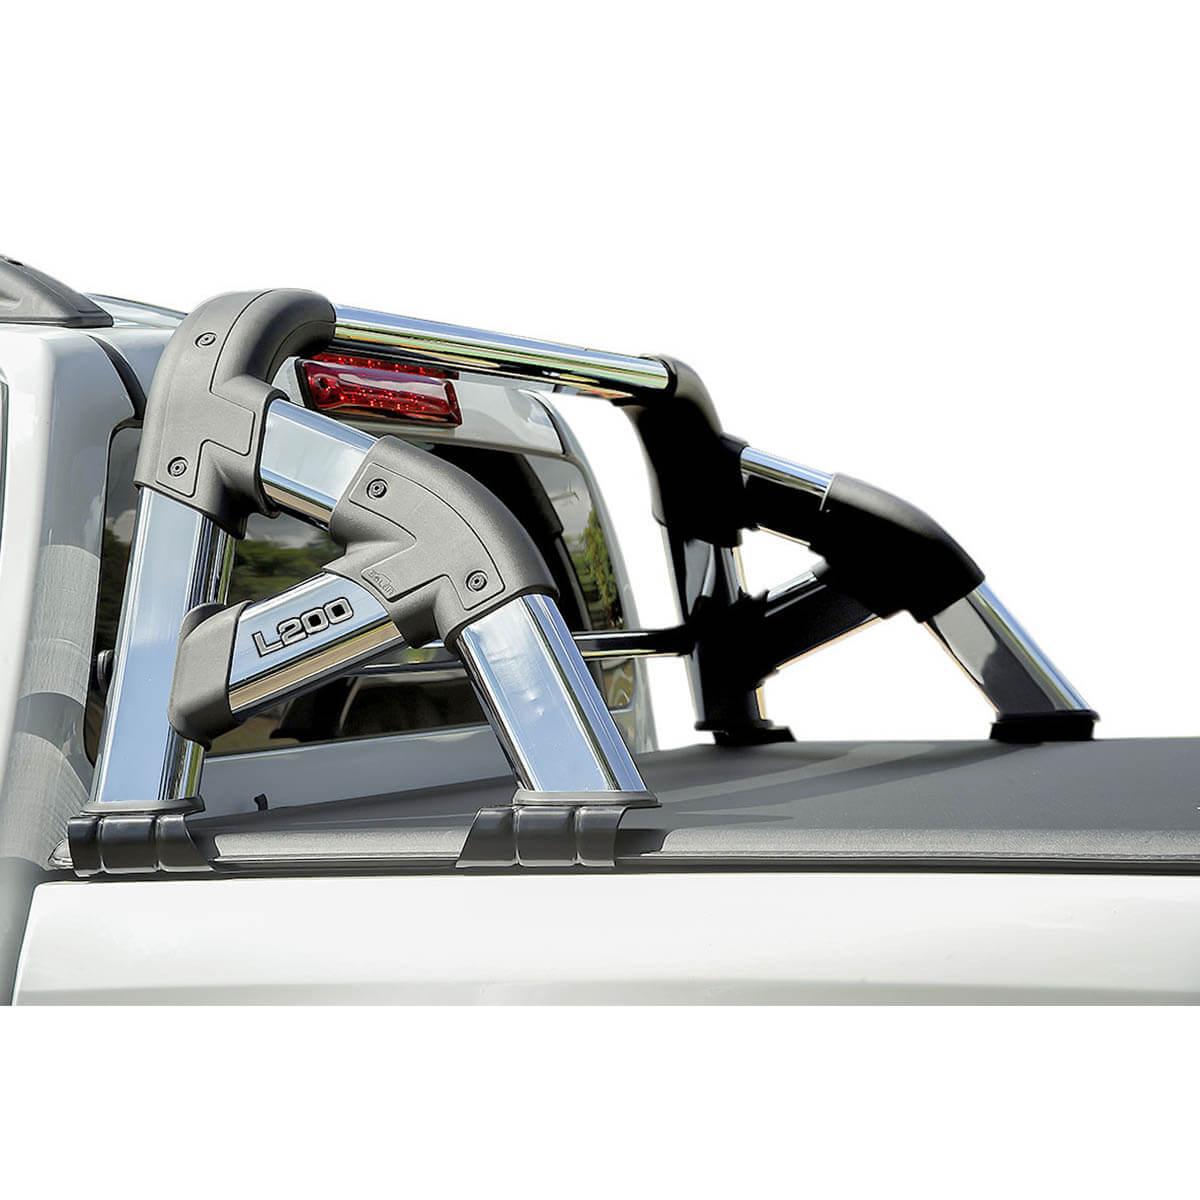 Santo antônio cromado Solar Exclusive L200 Sport 2004 a 2007 ou L200 Outdoor 2007 a 2012 com barra de vidro cromada